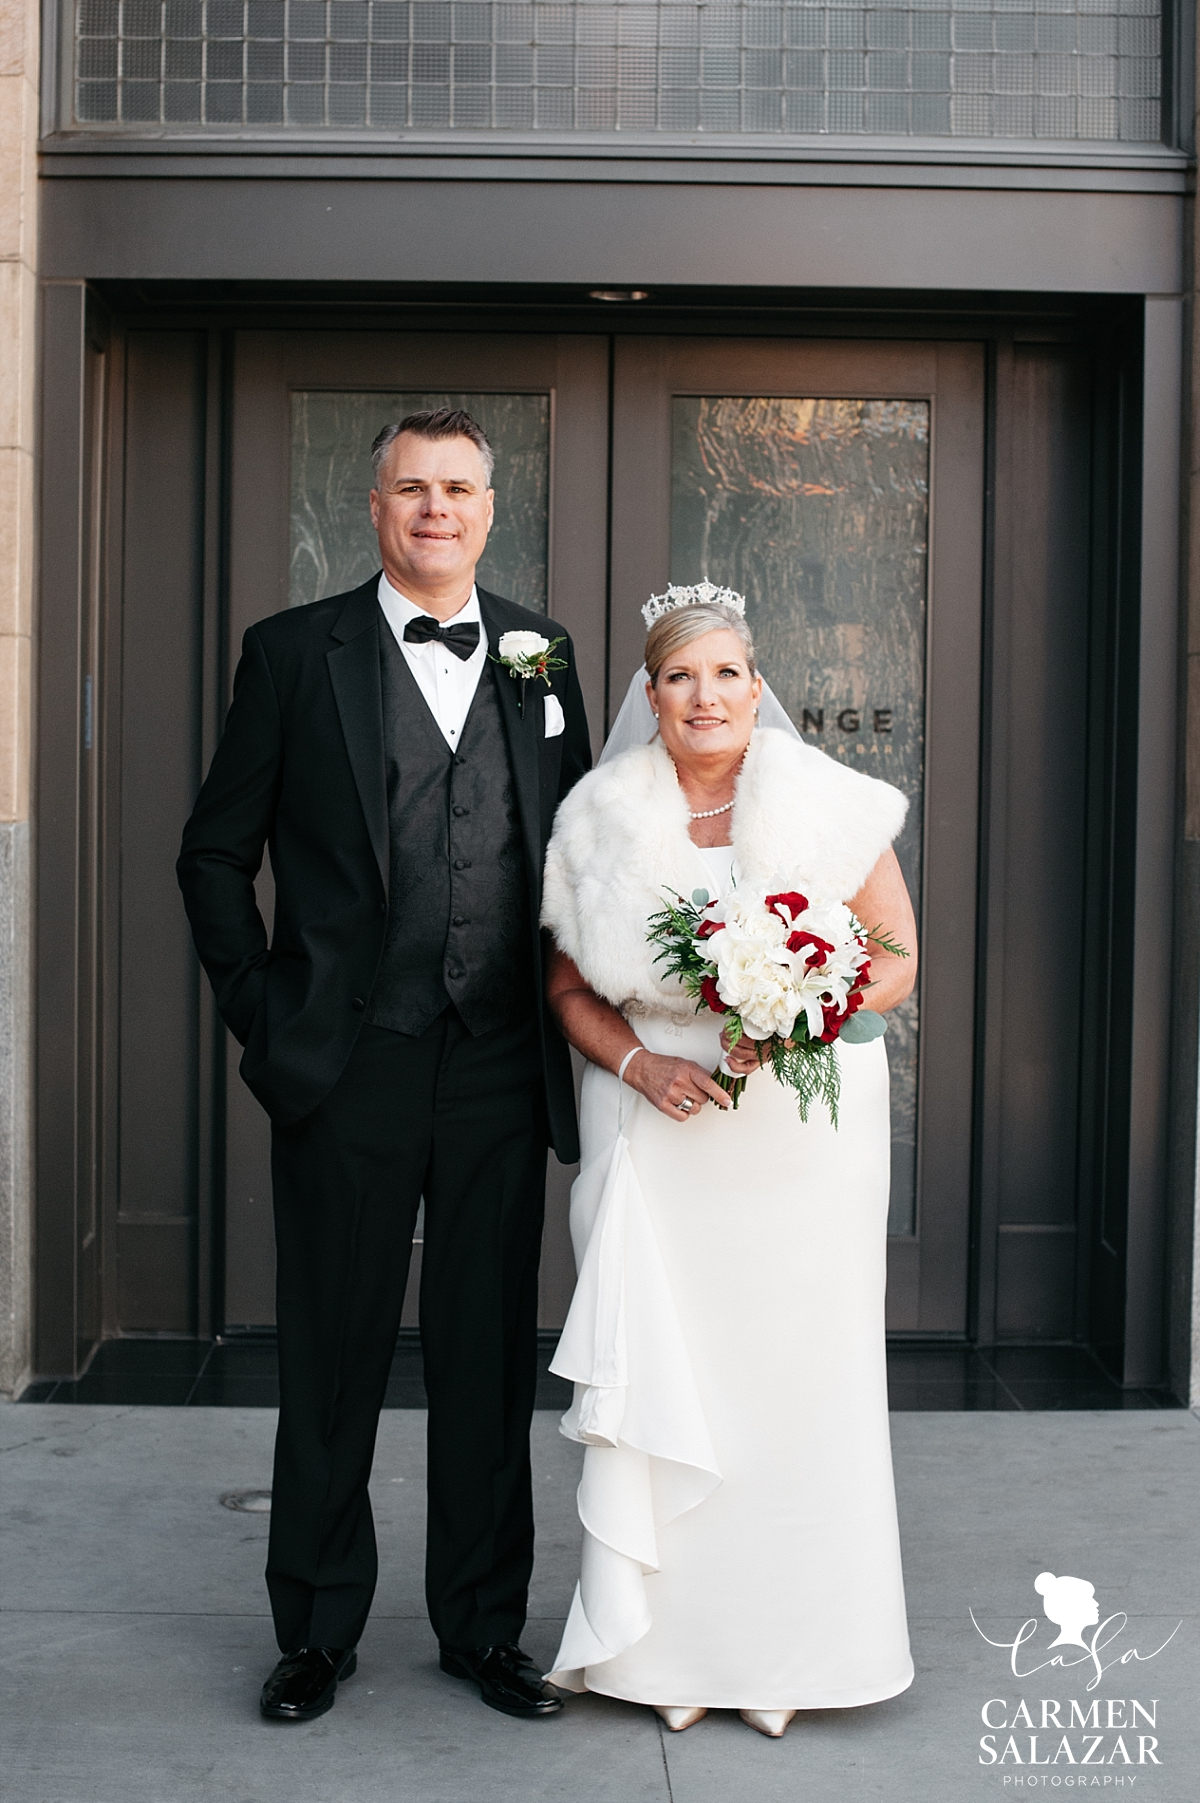 Bride and groom portraits in front of The Grange - Carmen Salazar